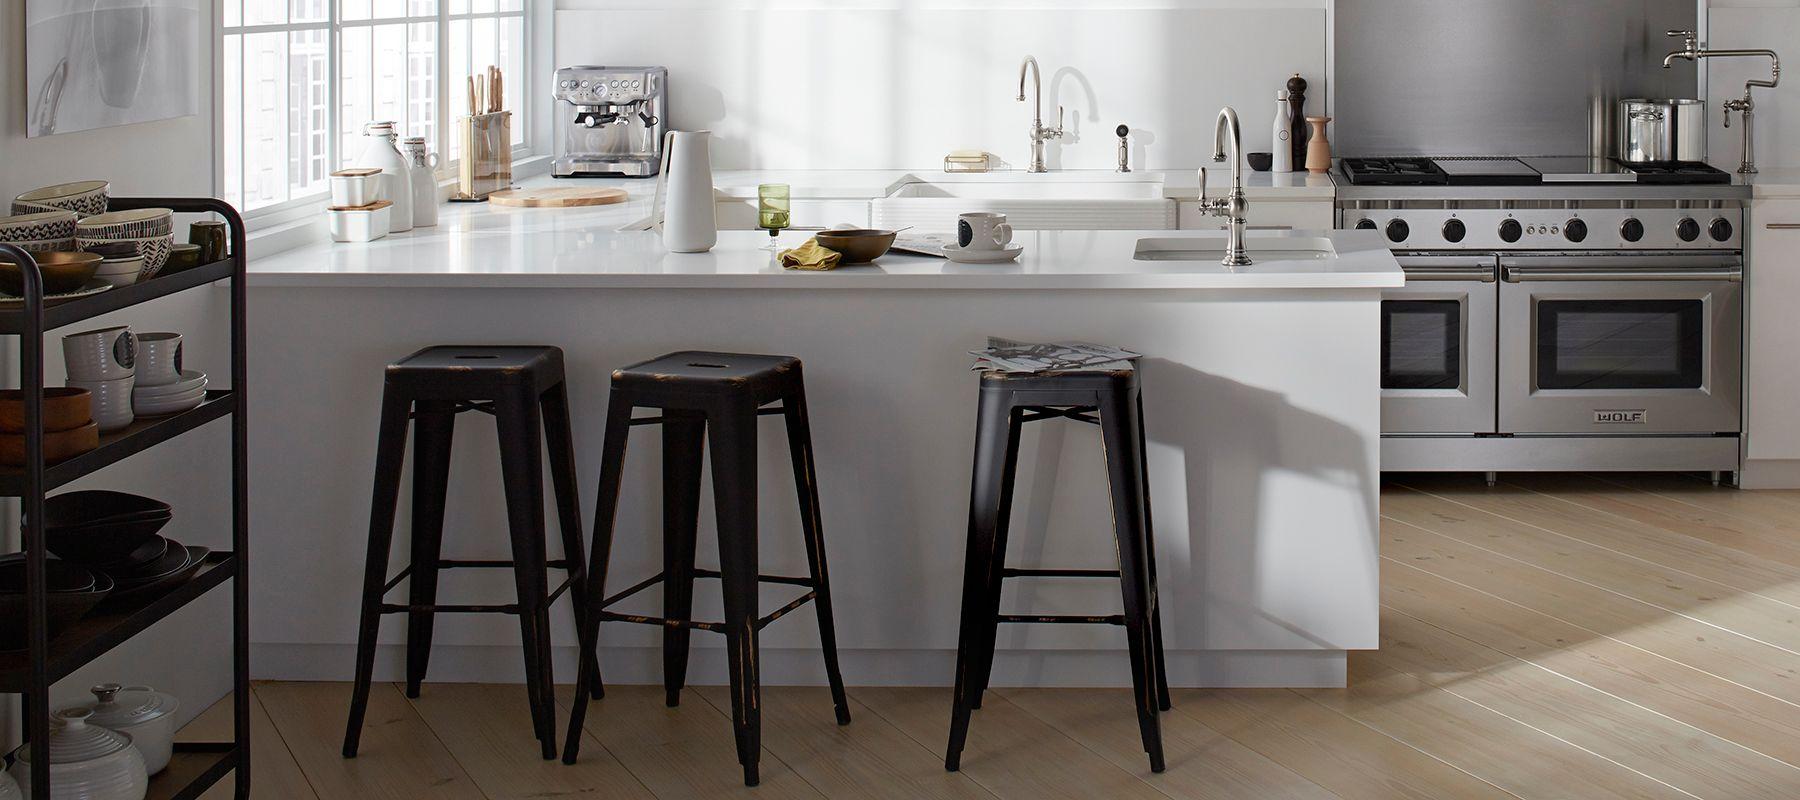 kohler kitchen sink faucets modular wall cabinets